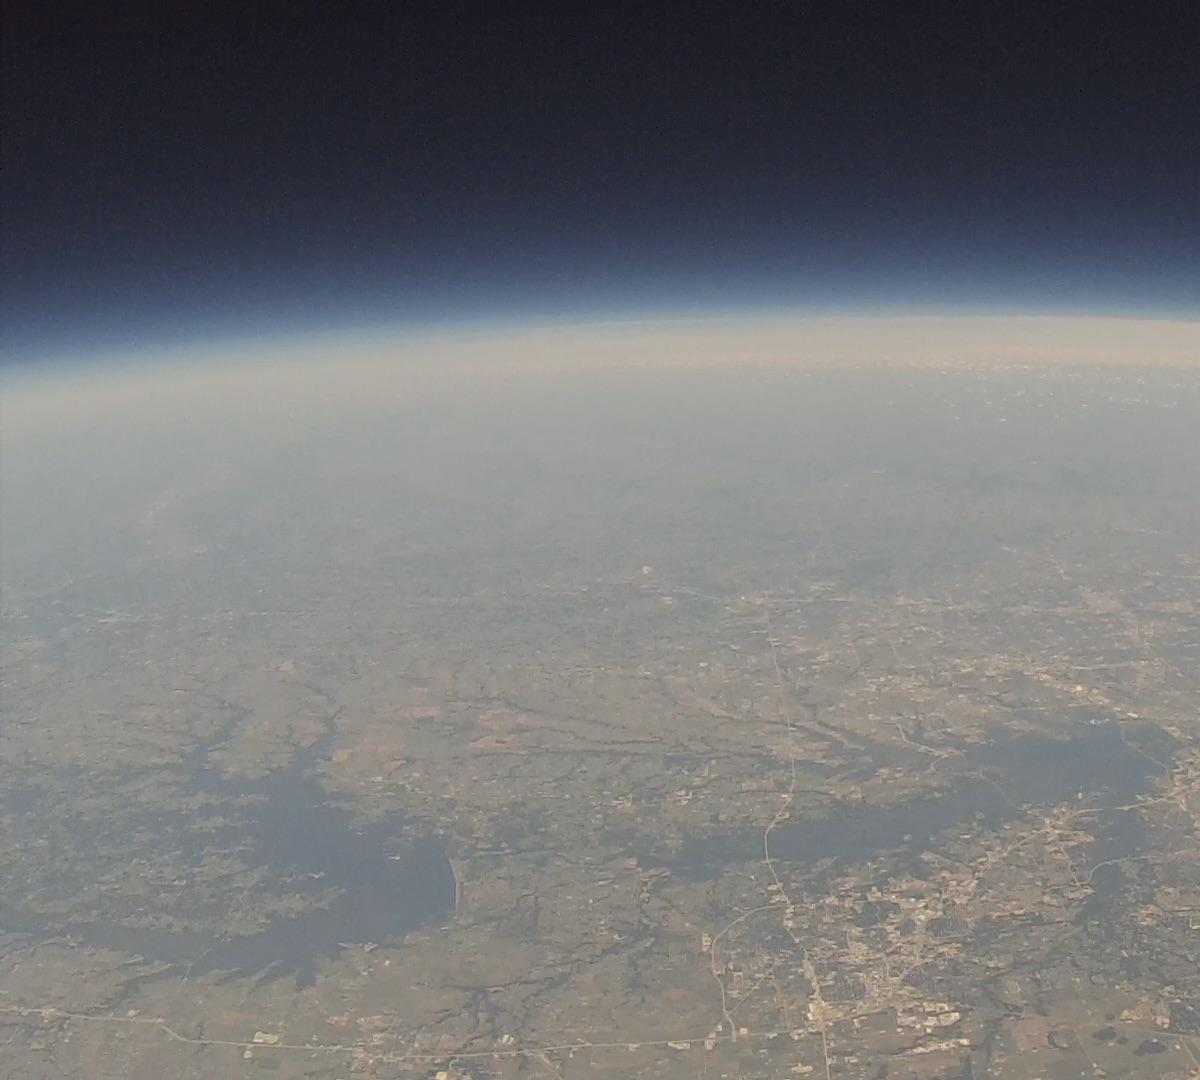 STRAT-4_Denton_from_near_space.jpg